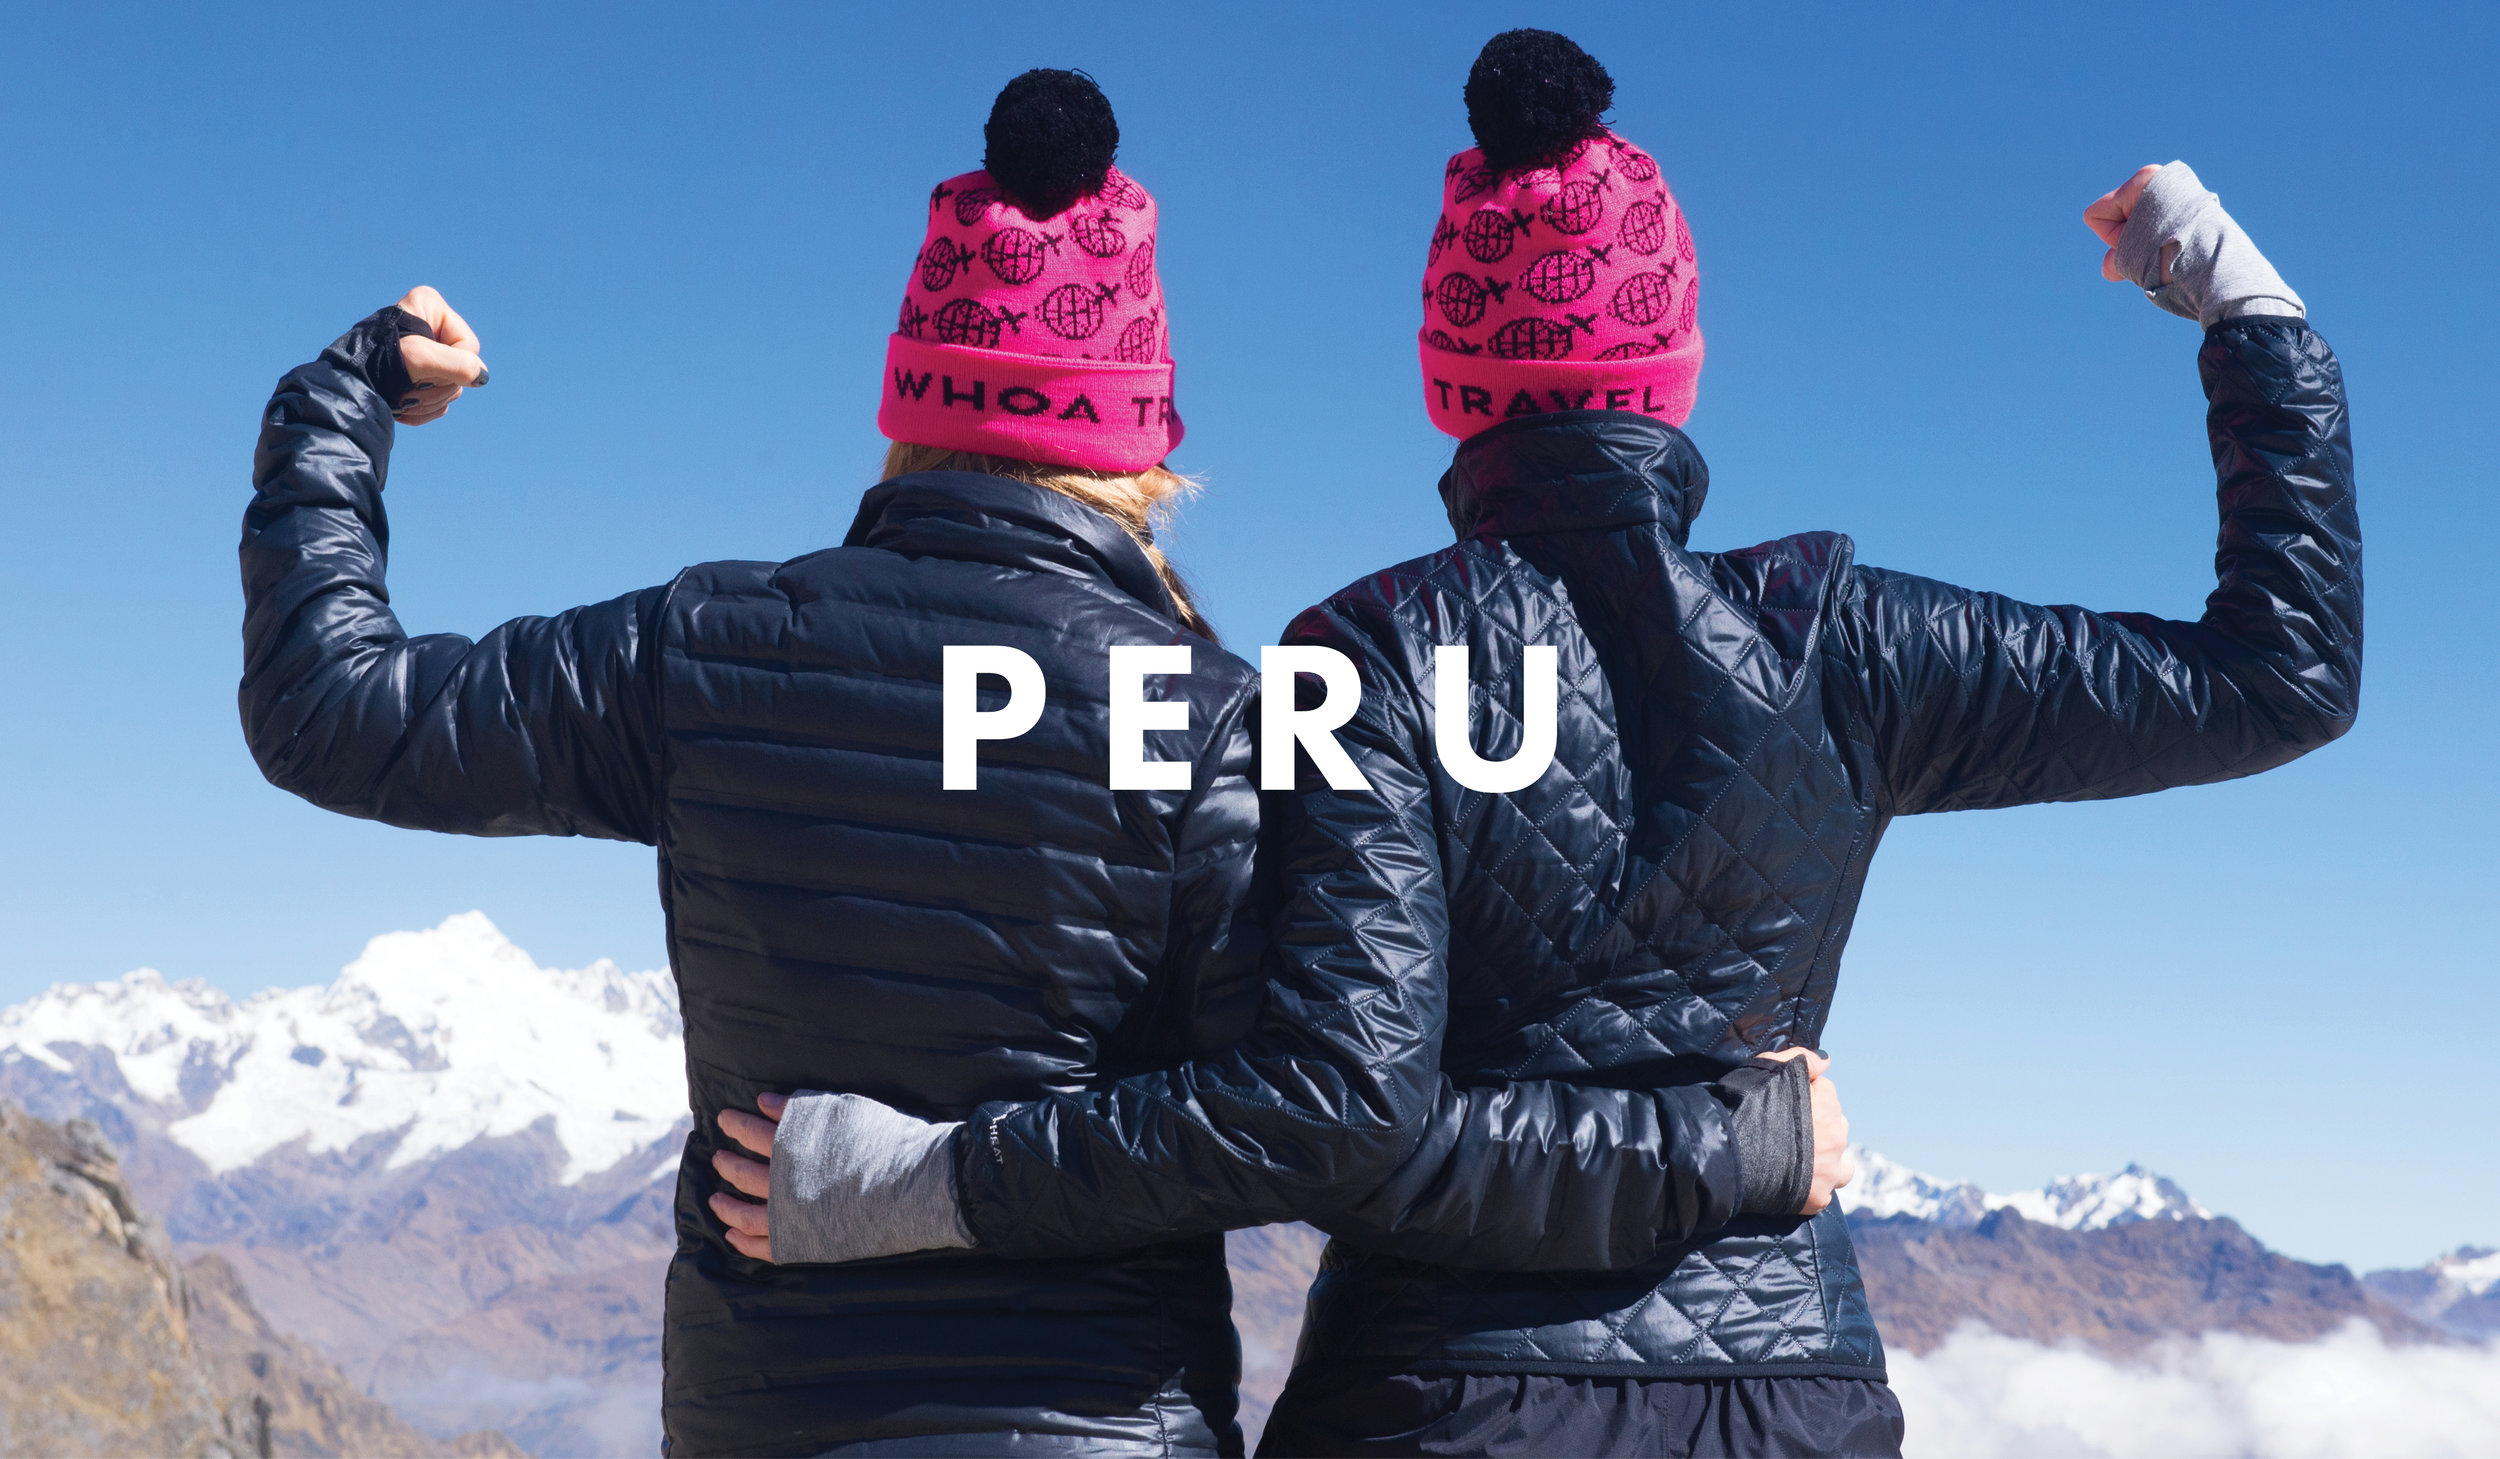 PERU with WHOA2.jpg